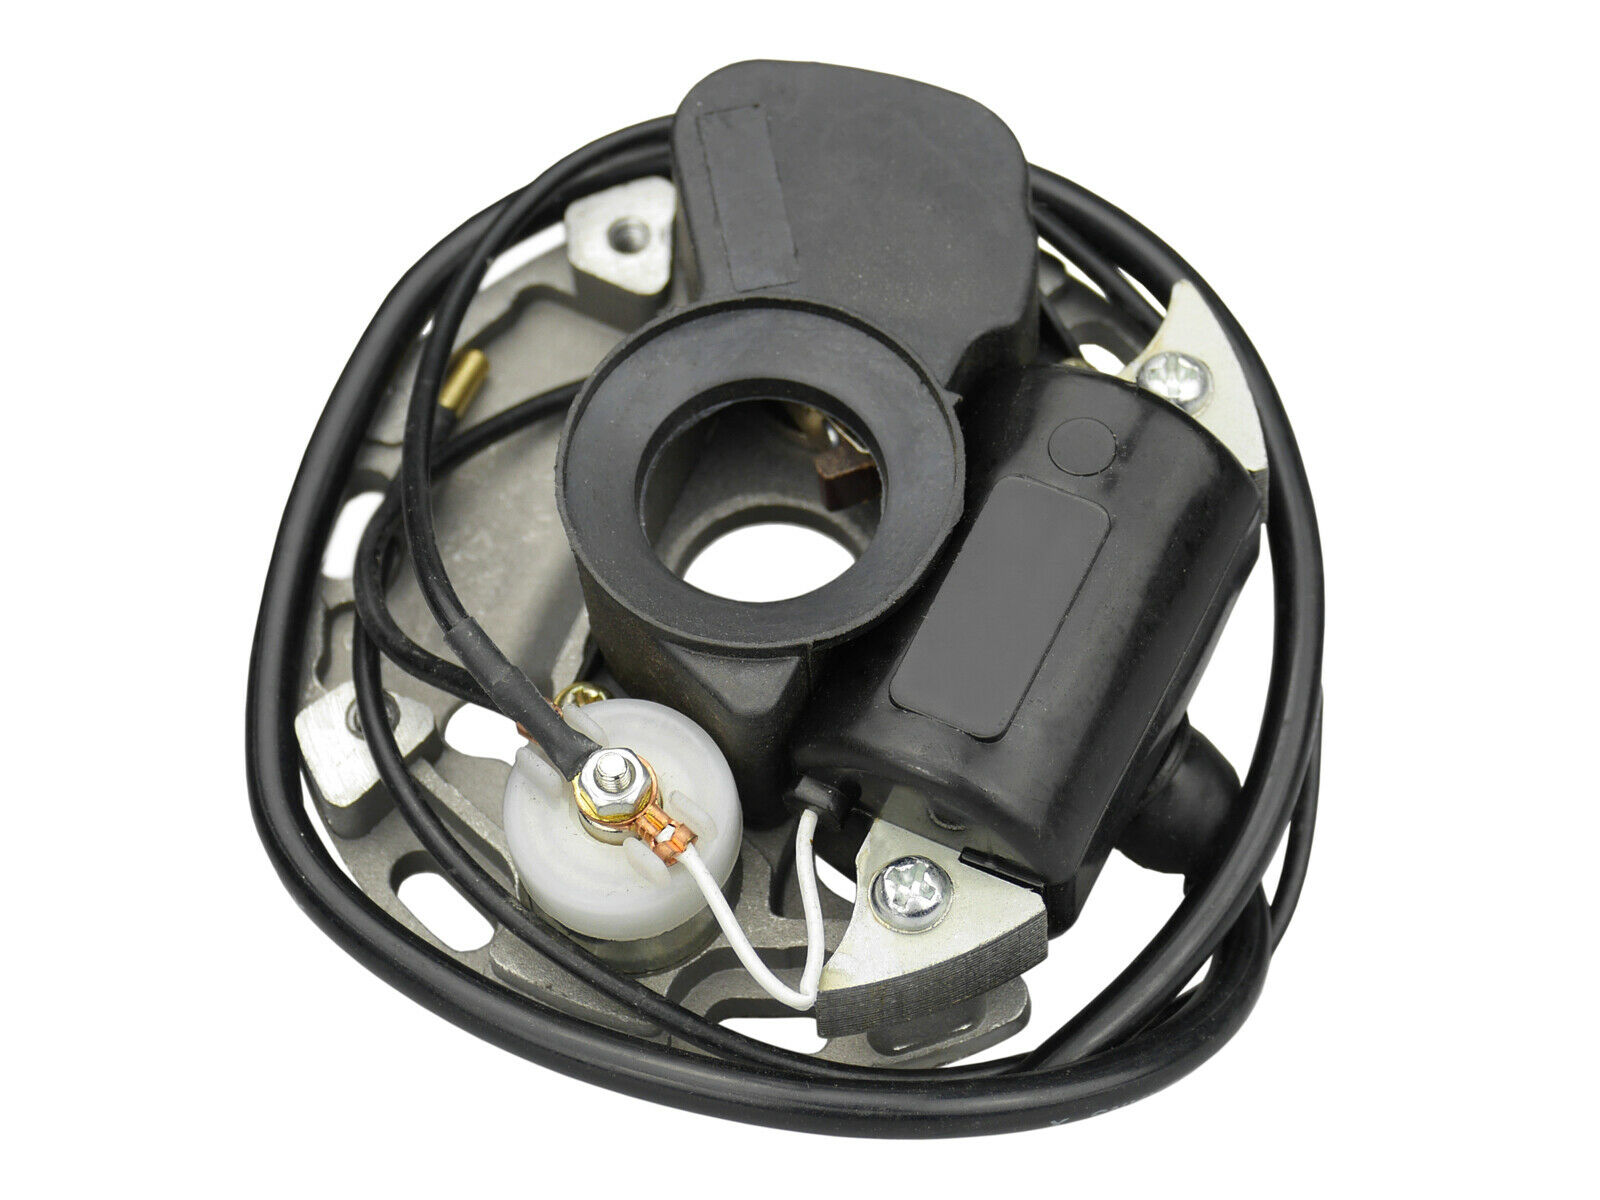 Zündmodul für Stihl 070 090 Contra AV 070AV ignition coil Elektronische Zündung